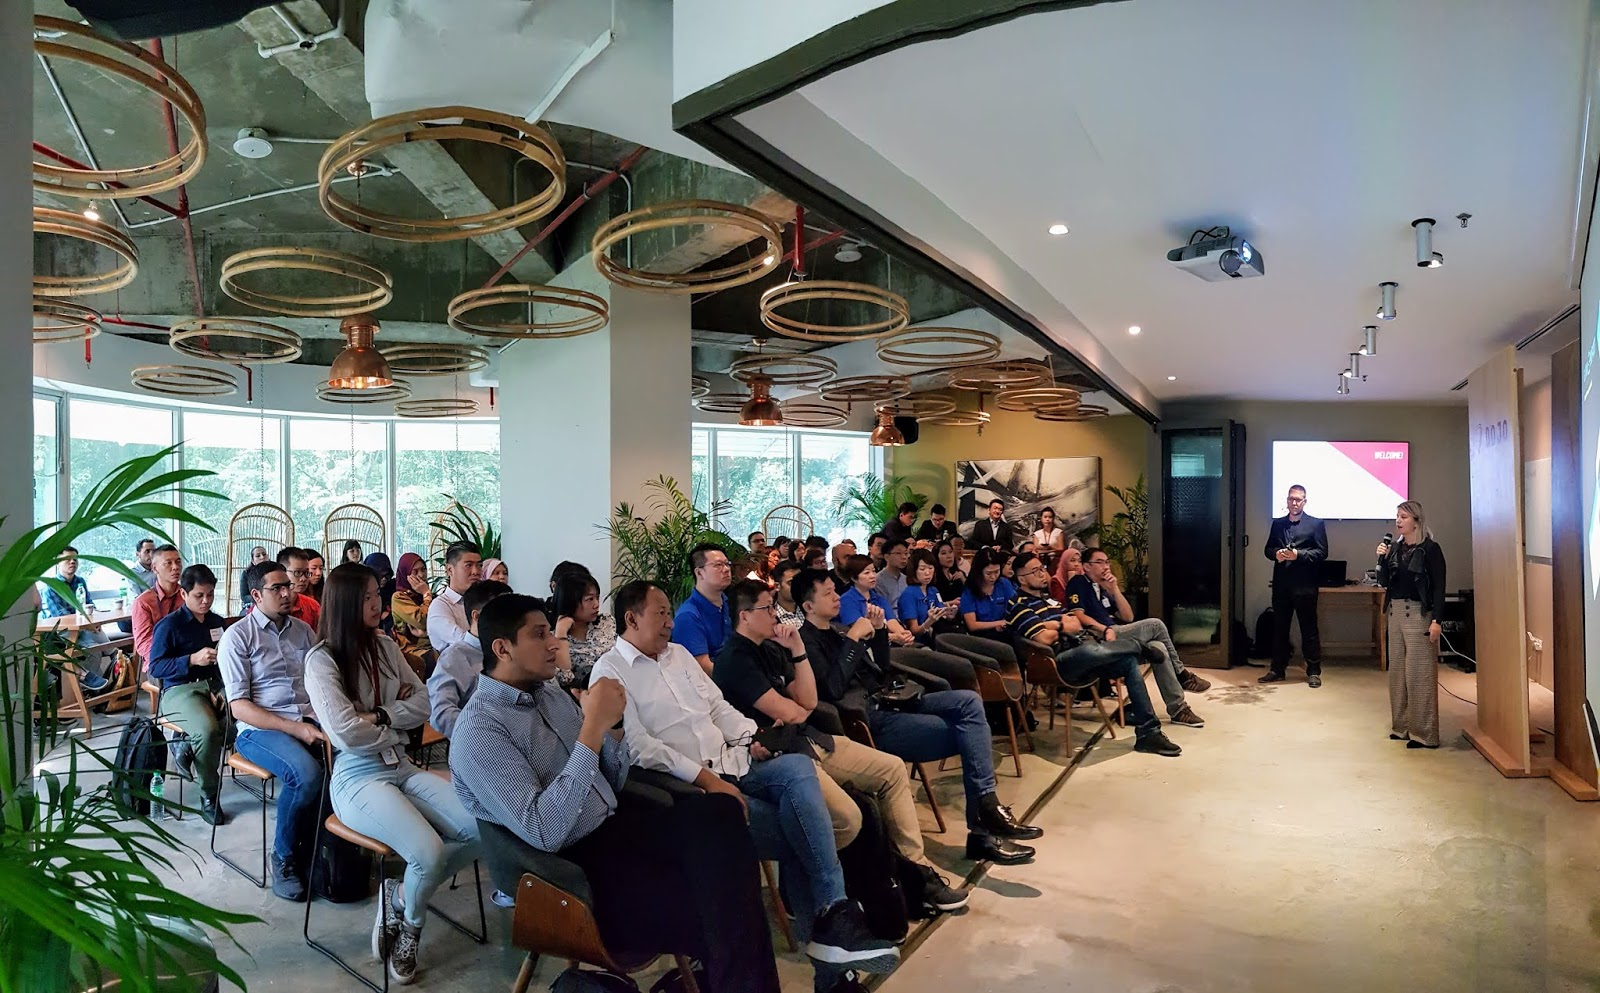 Innov8tif Blog: 7 Speakers Shared Their Views on eKYC in Kuala Lumpur